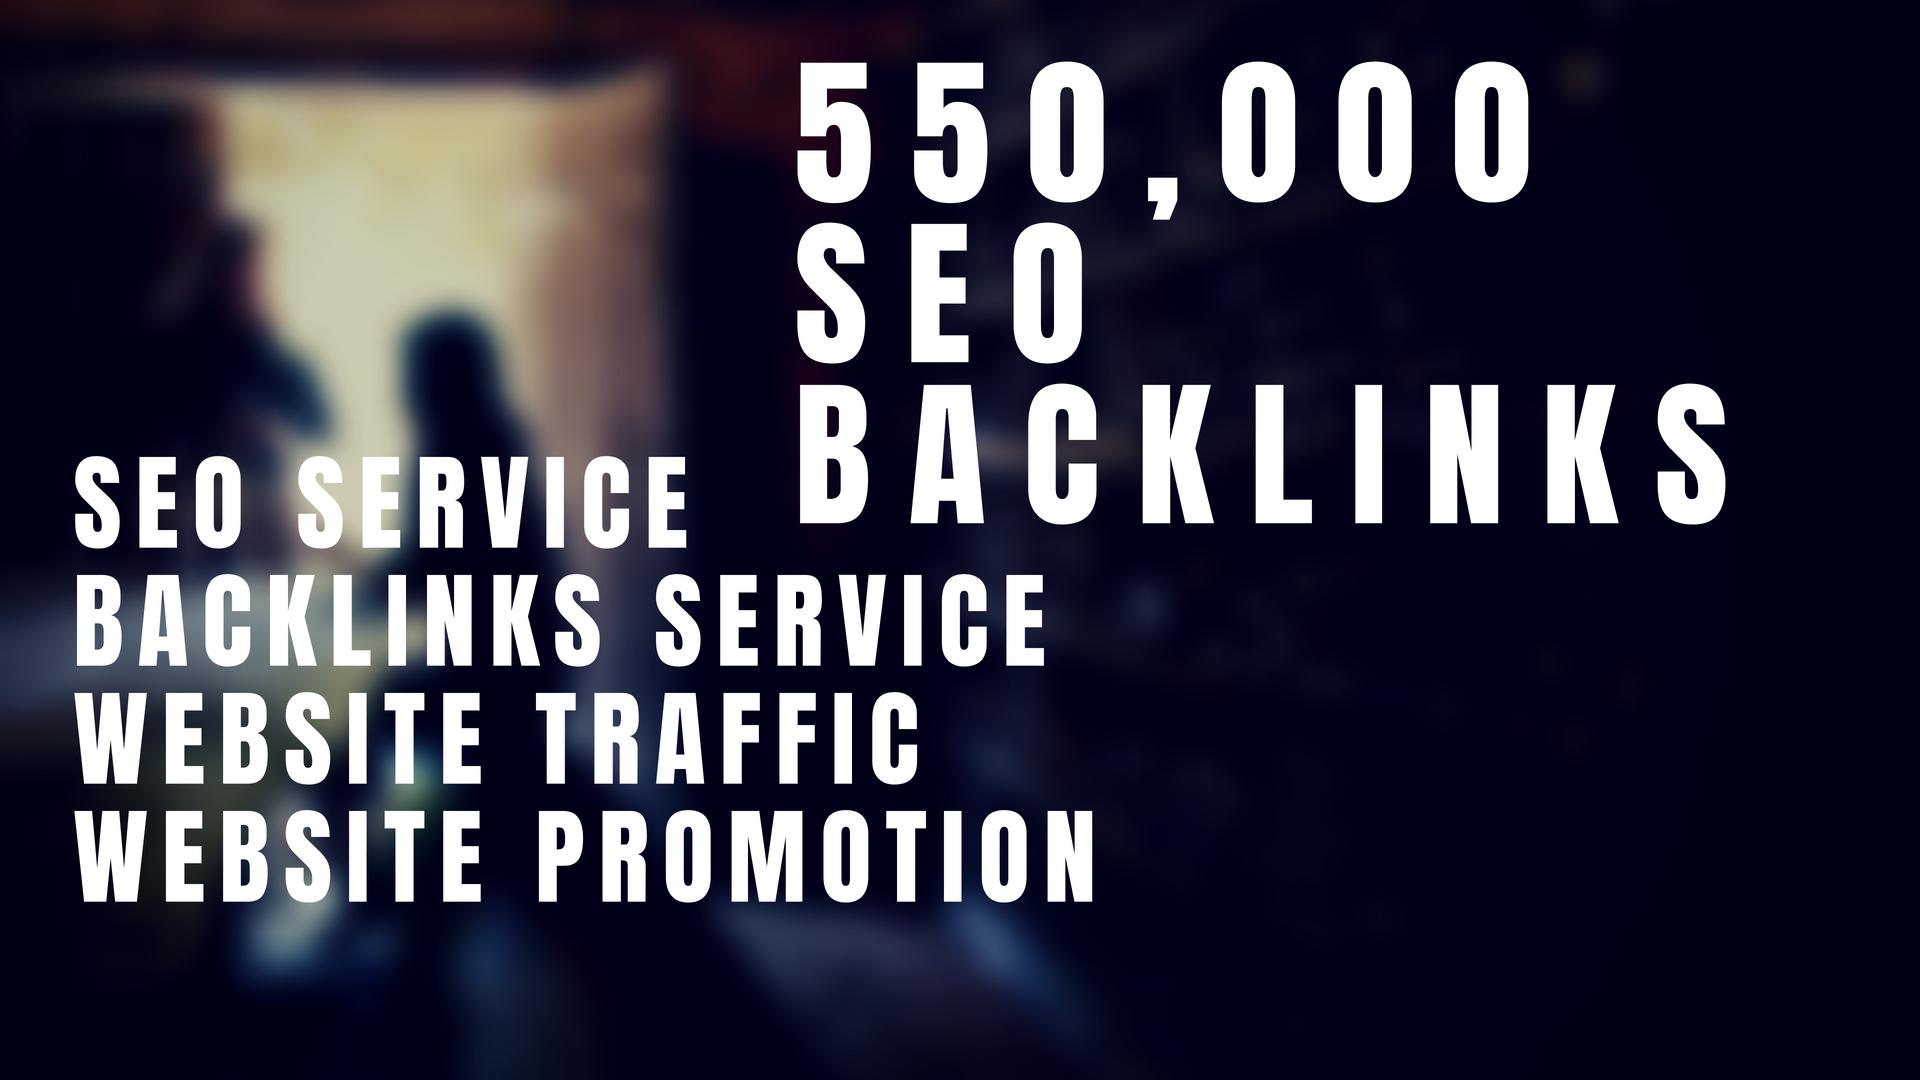 550,000 Seo Backlinks For Your Website